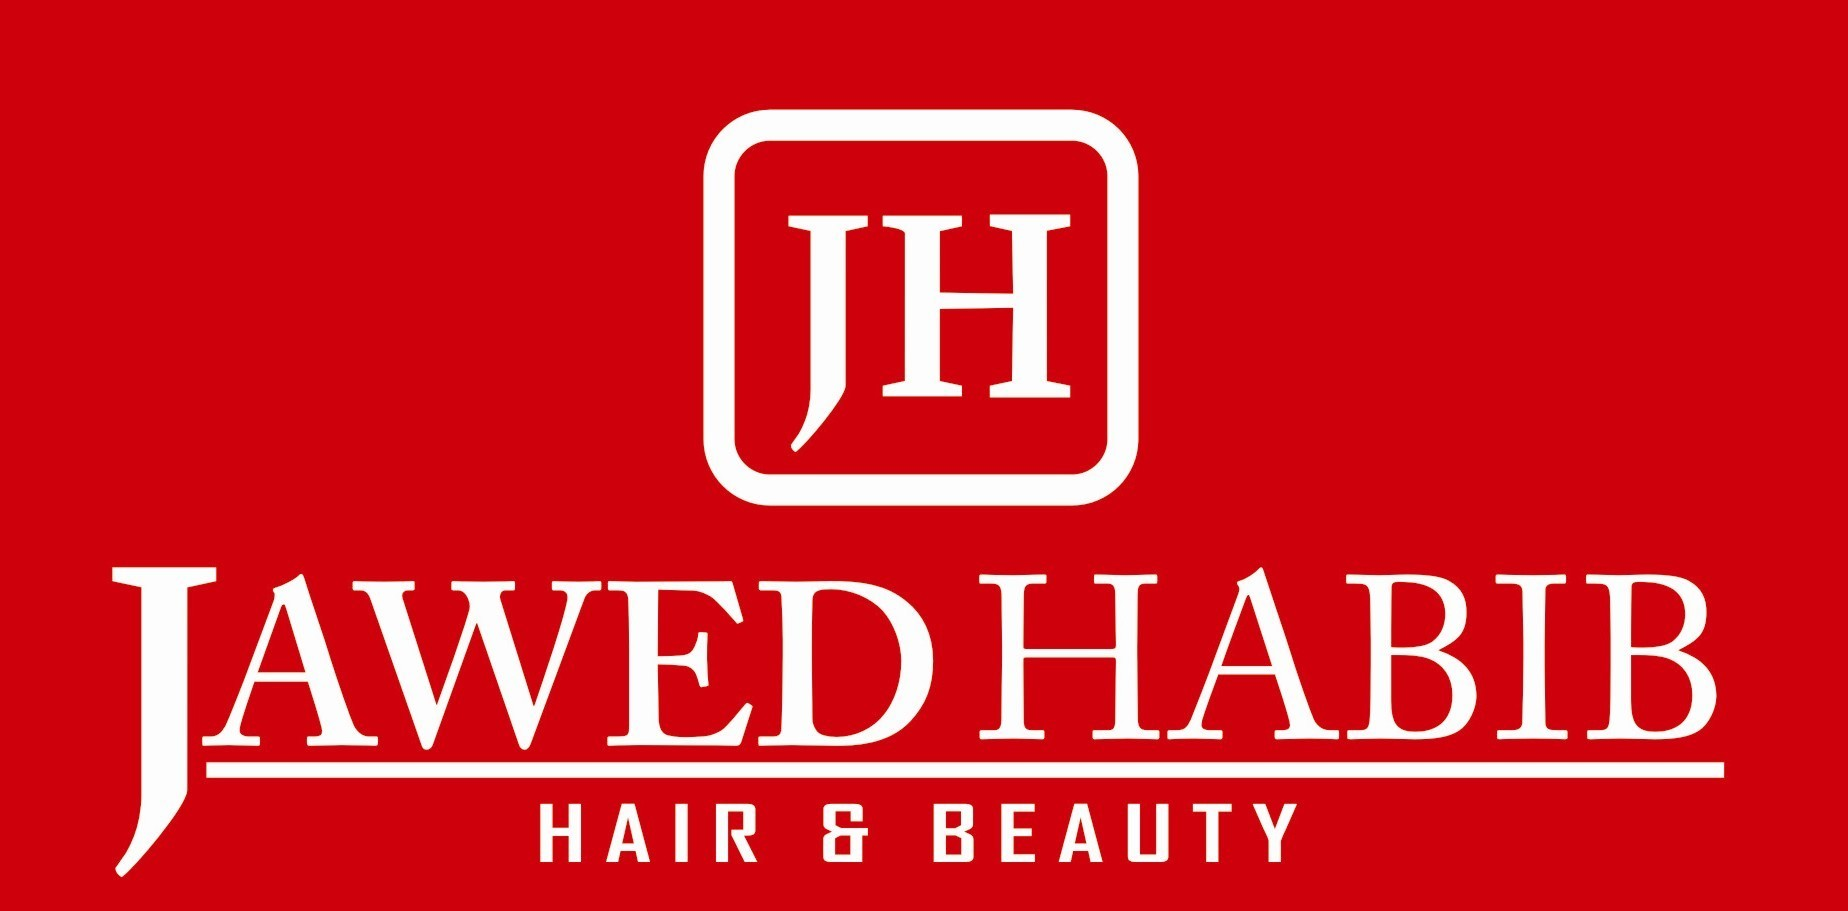 Jawed Habib Hair & Beauty Salons - Mehdipatnam - Hyderabad Image